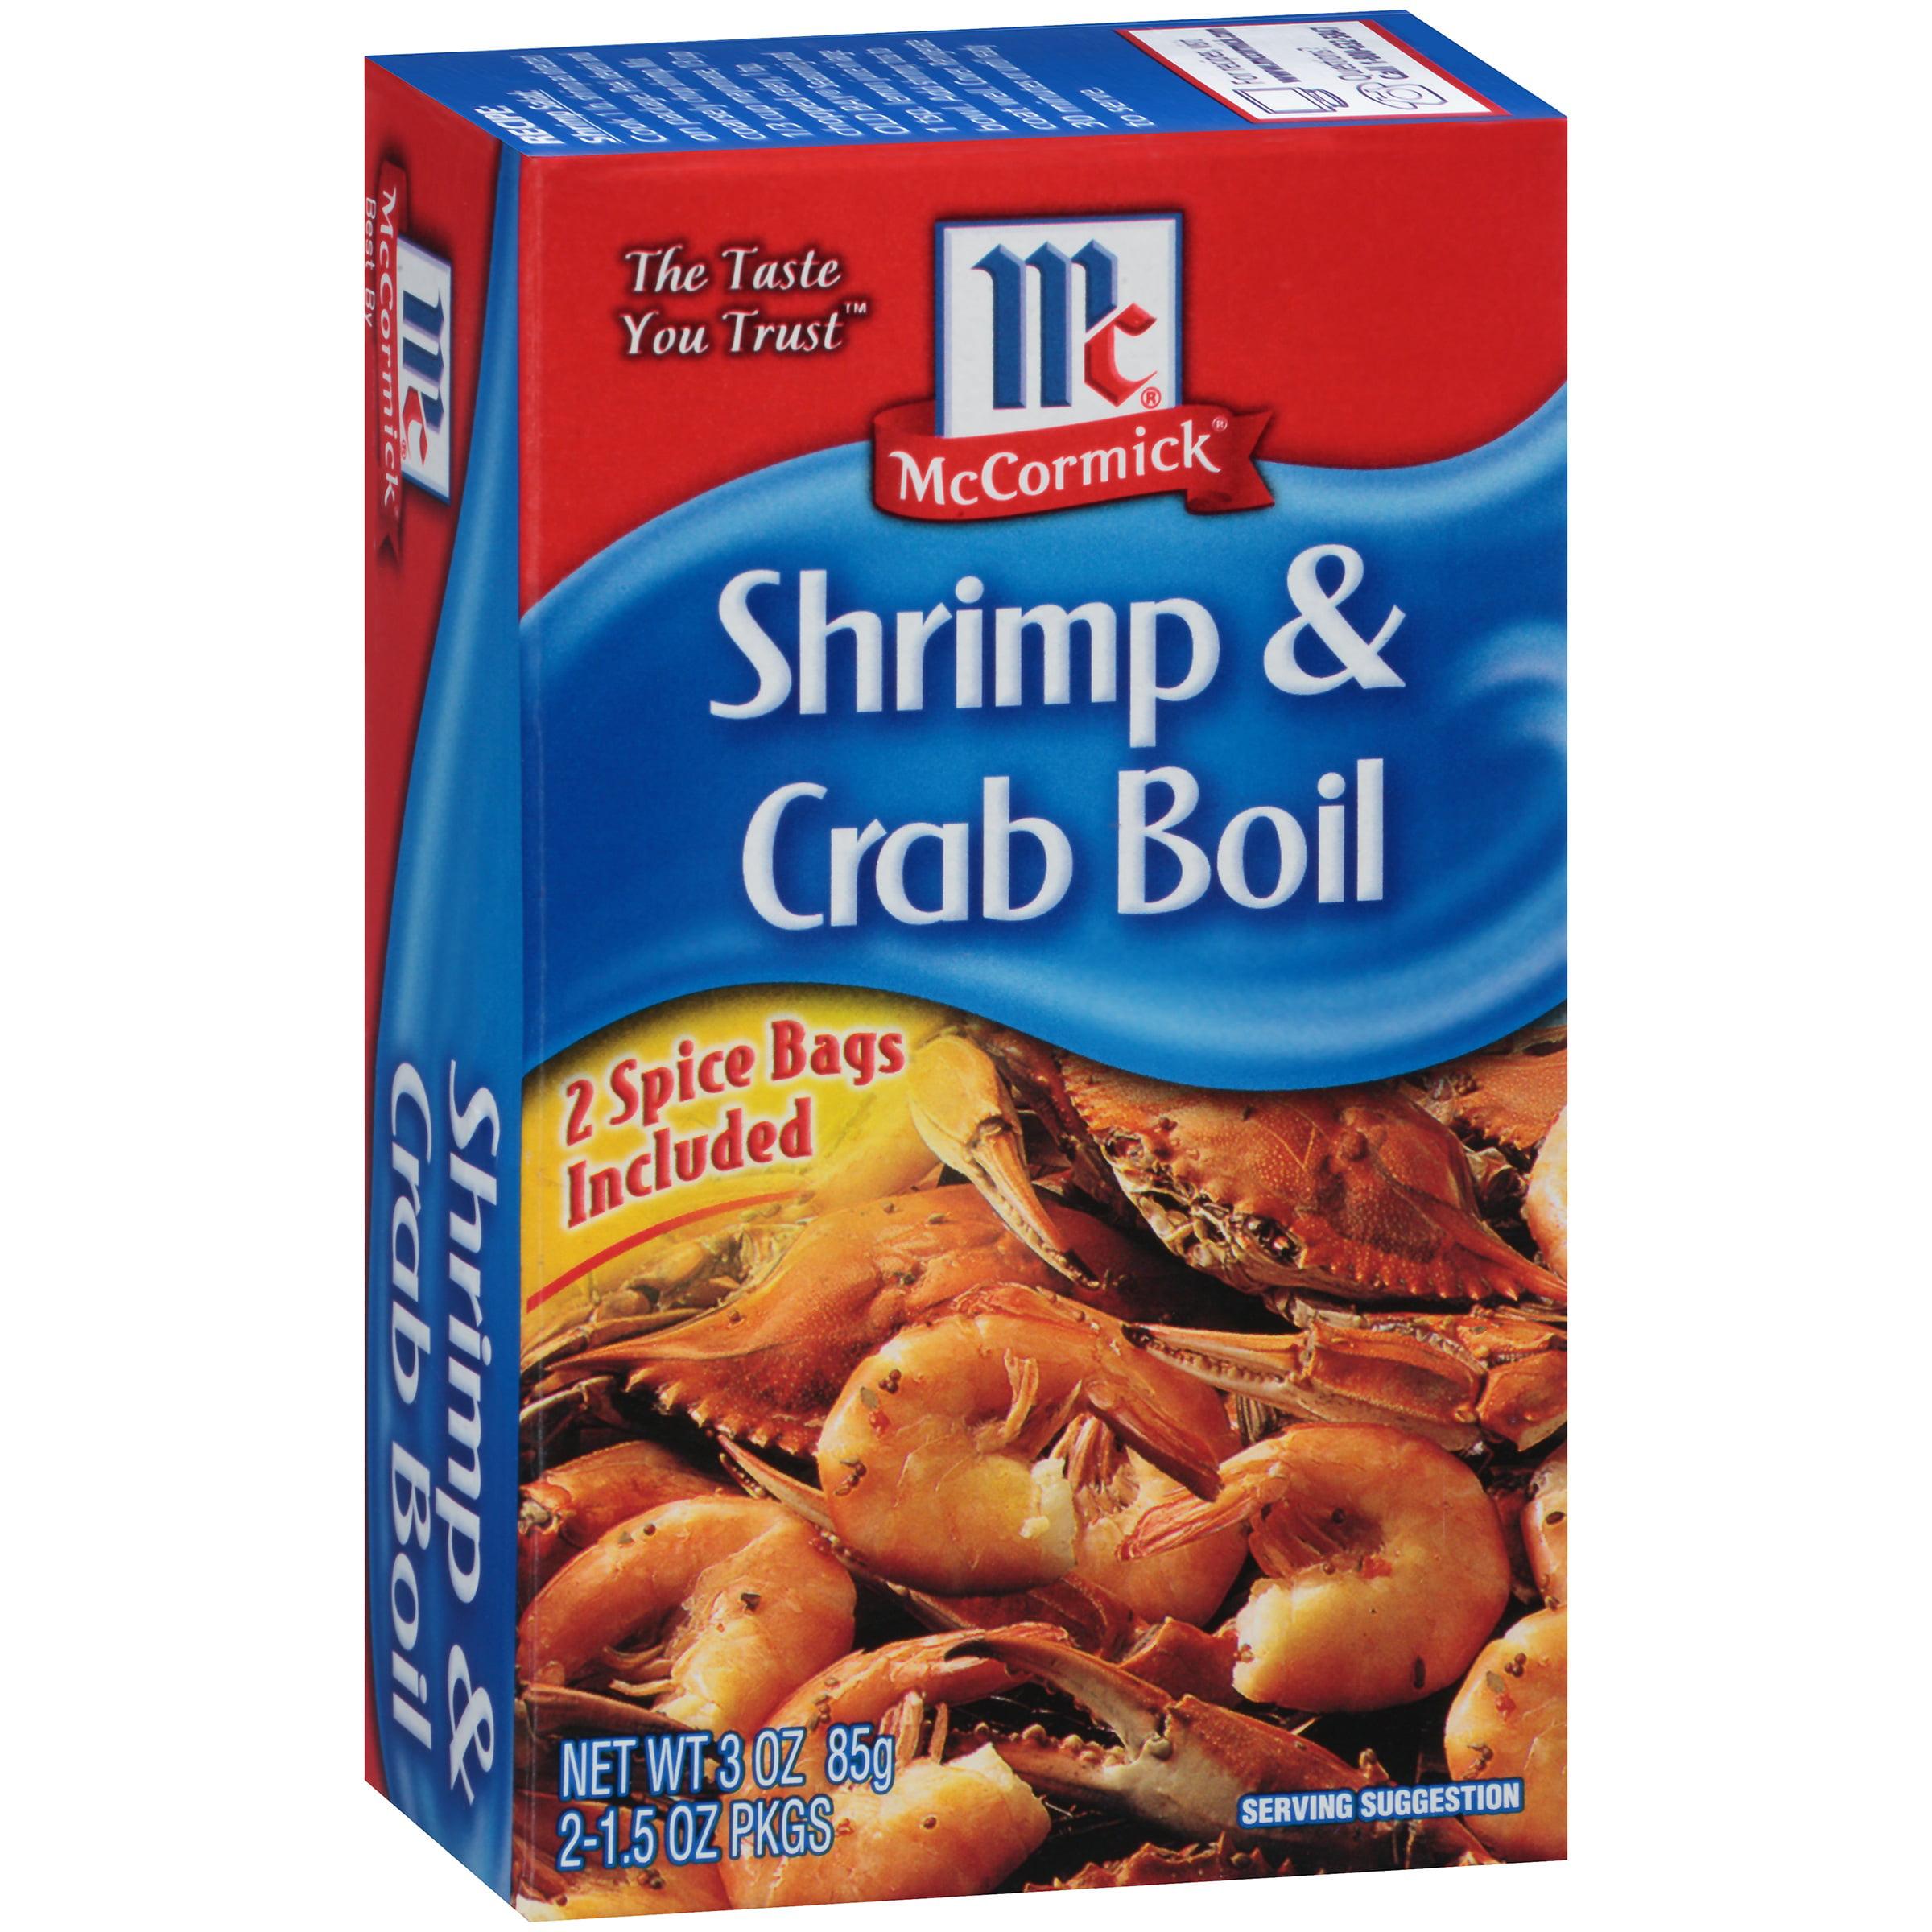 McCormick Golden Dipt Shrimp & Crab Boil, 3 oz. Box by McCormick & Co, Inc.